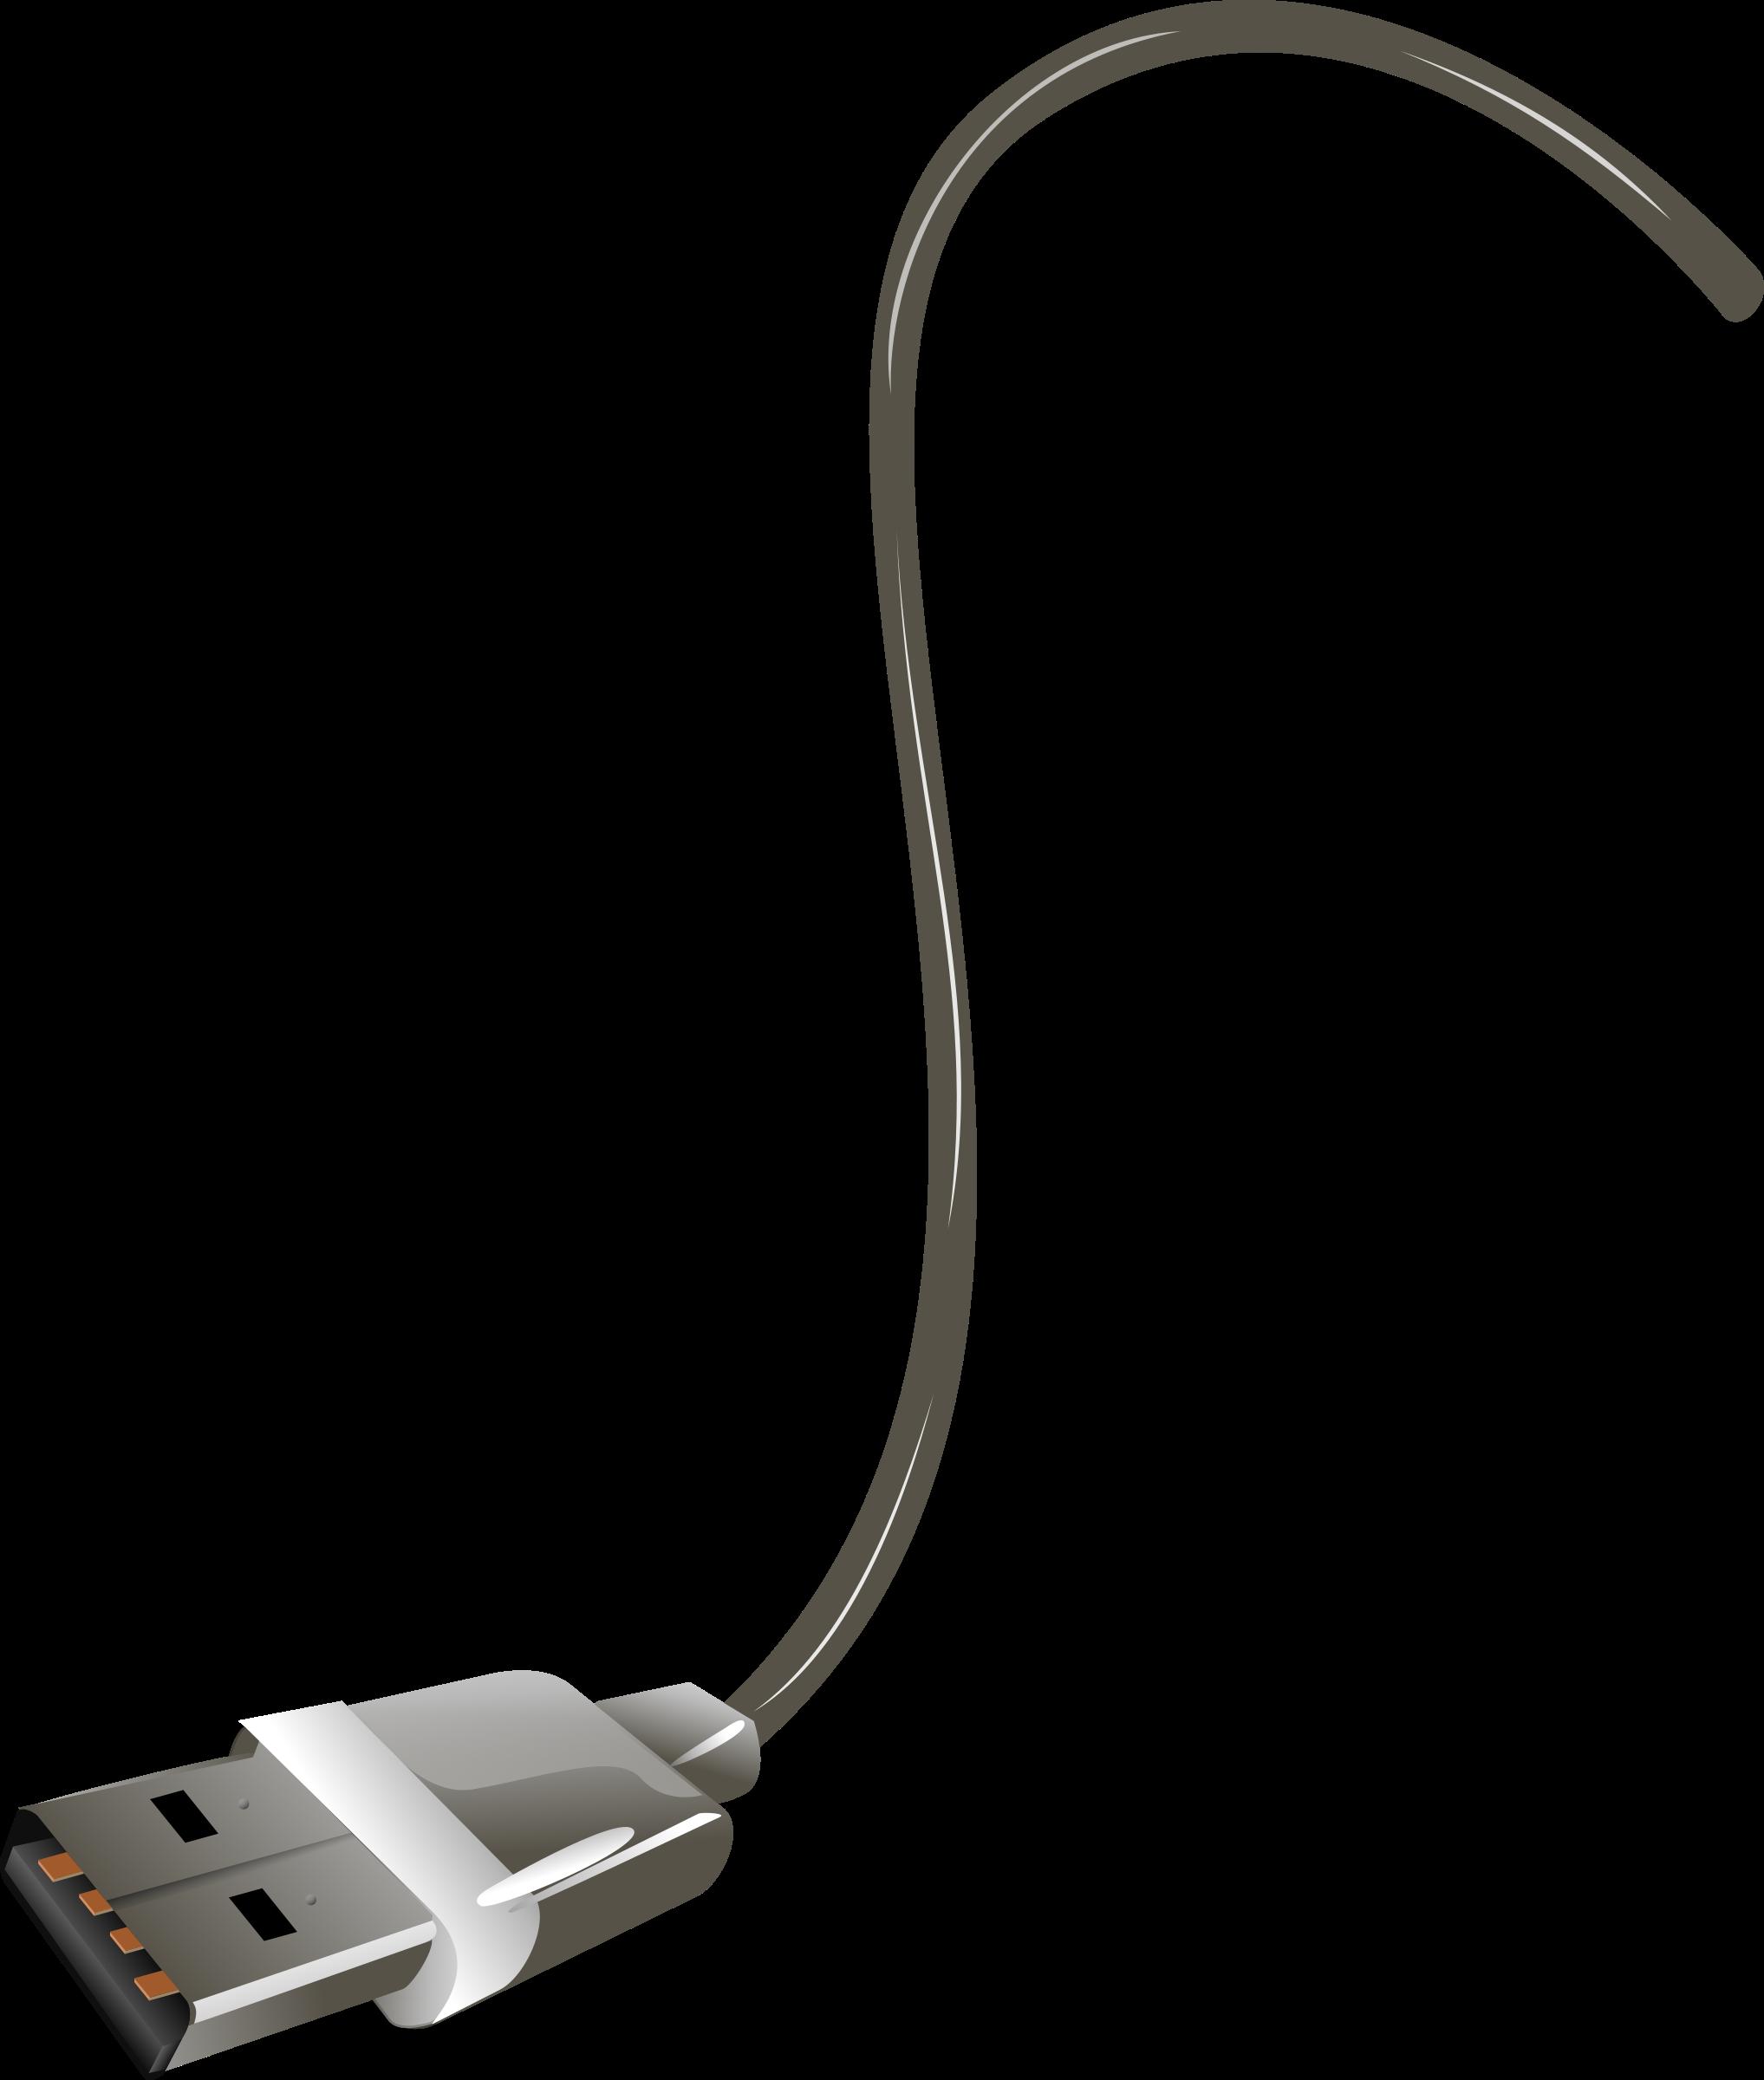 Electronics clipart cable. Usb remix big image